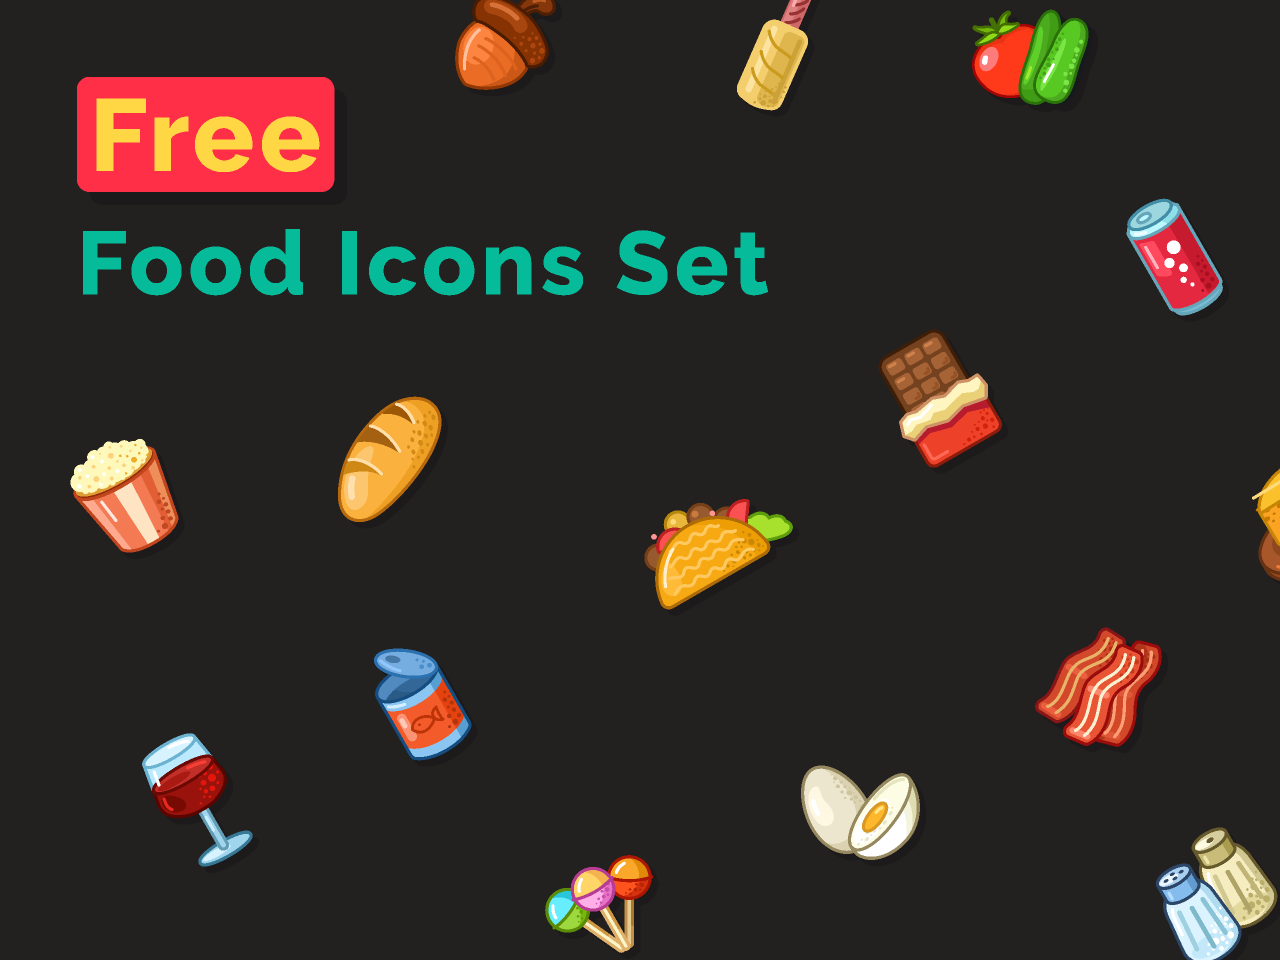 Free Food Icons Set Figma free